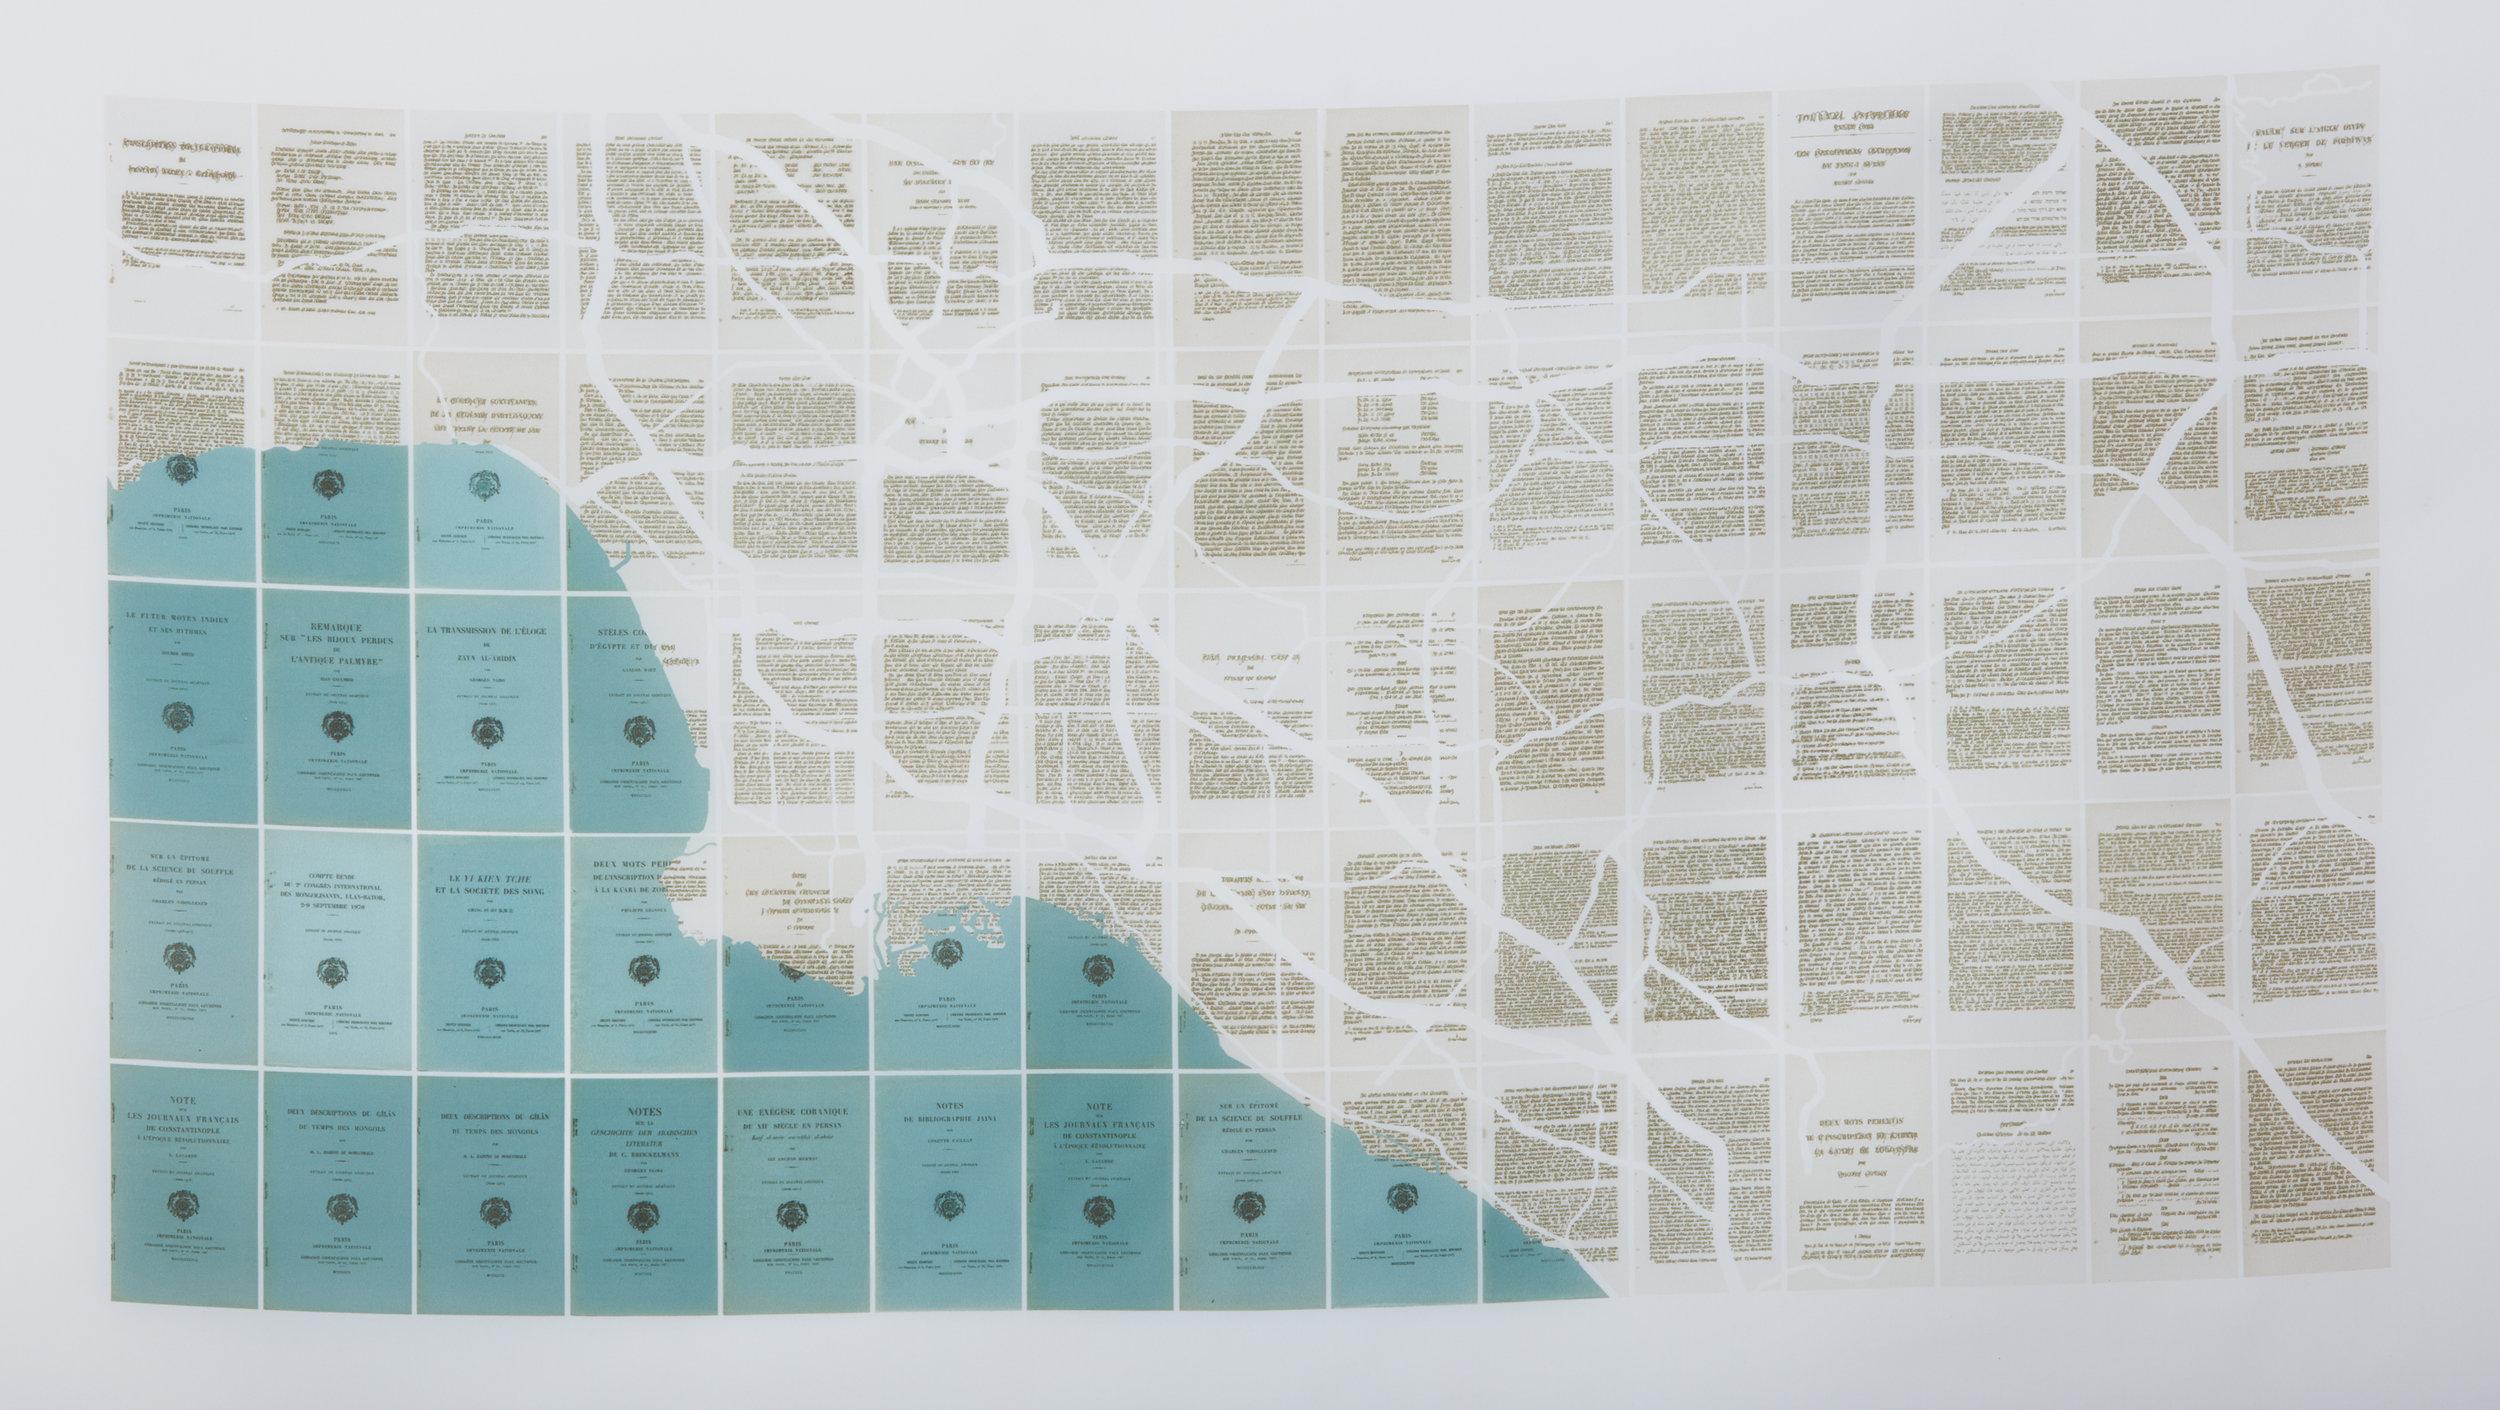 Behemoth Los Angeles, 2017. Inkjet impression on silk/organza, 27 x 46in (71 x 117cm). Edition of 4